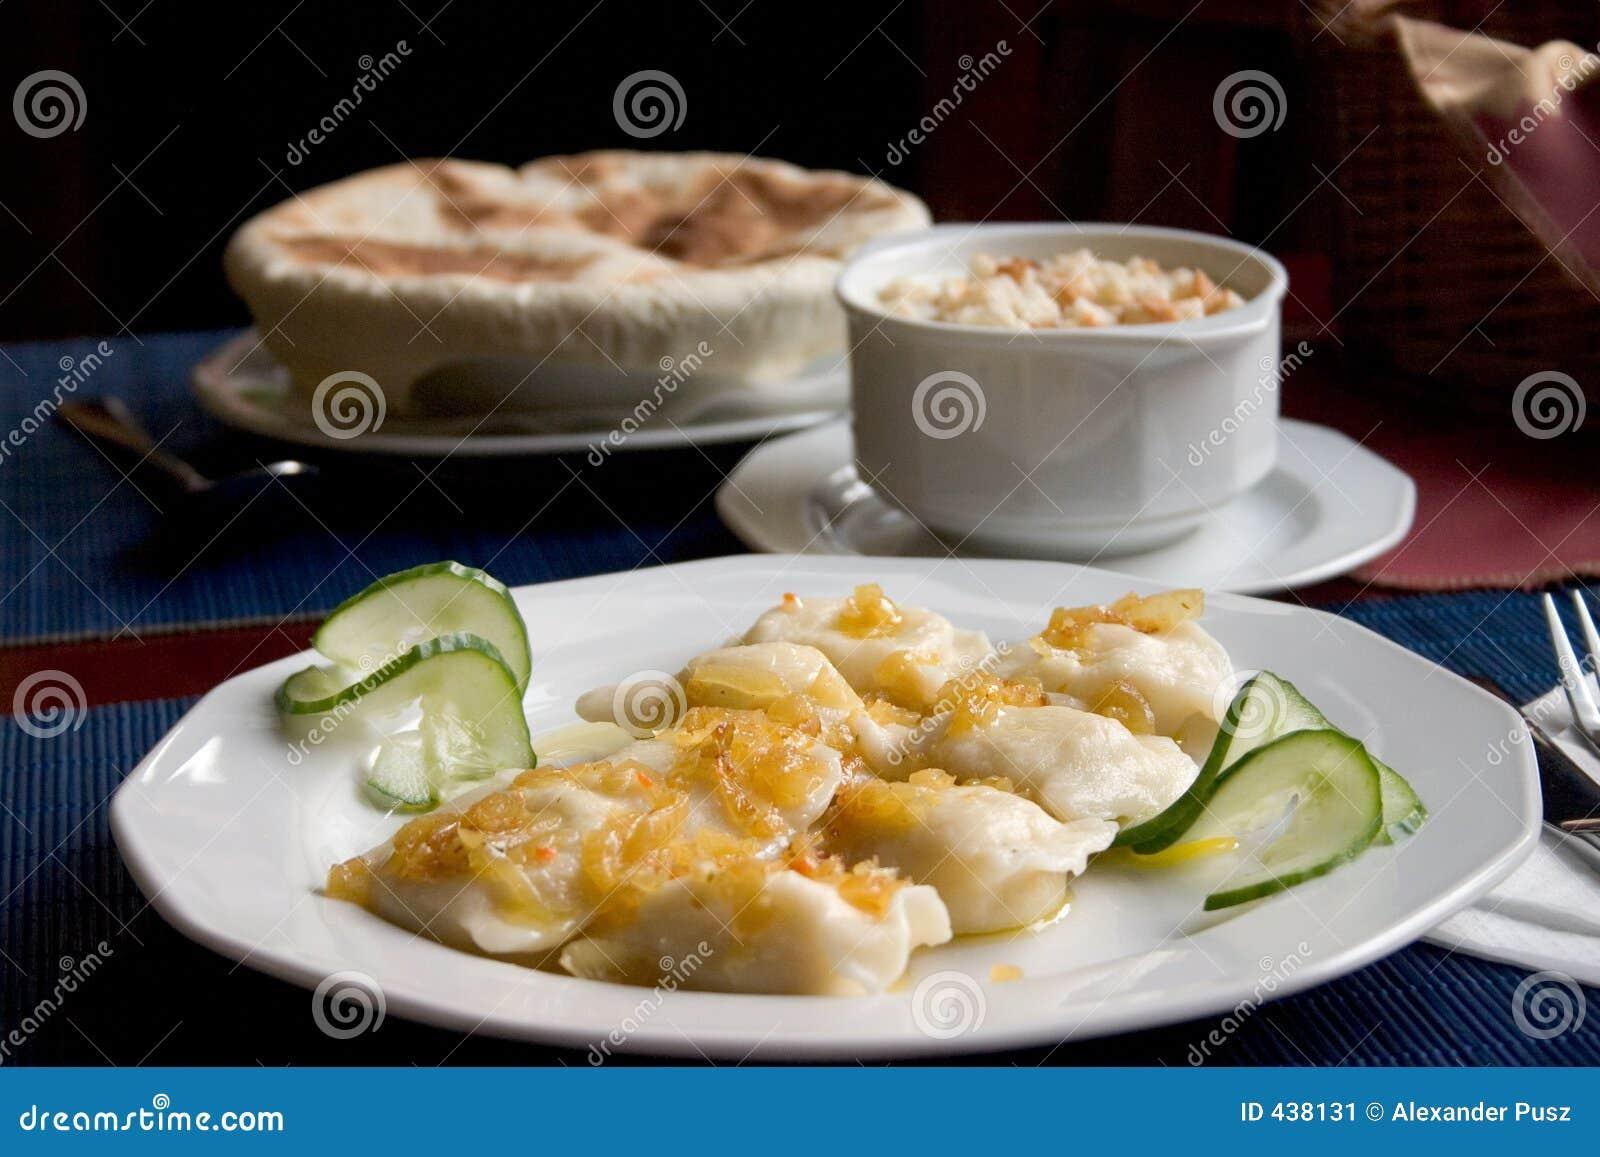 Pierogi polonais et potage italien